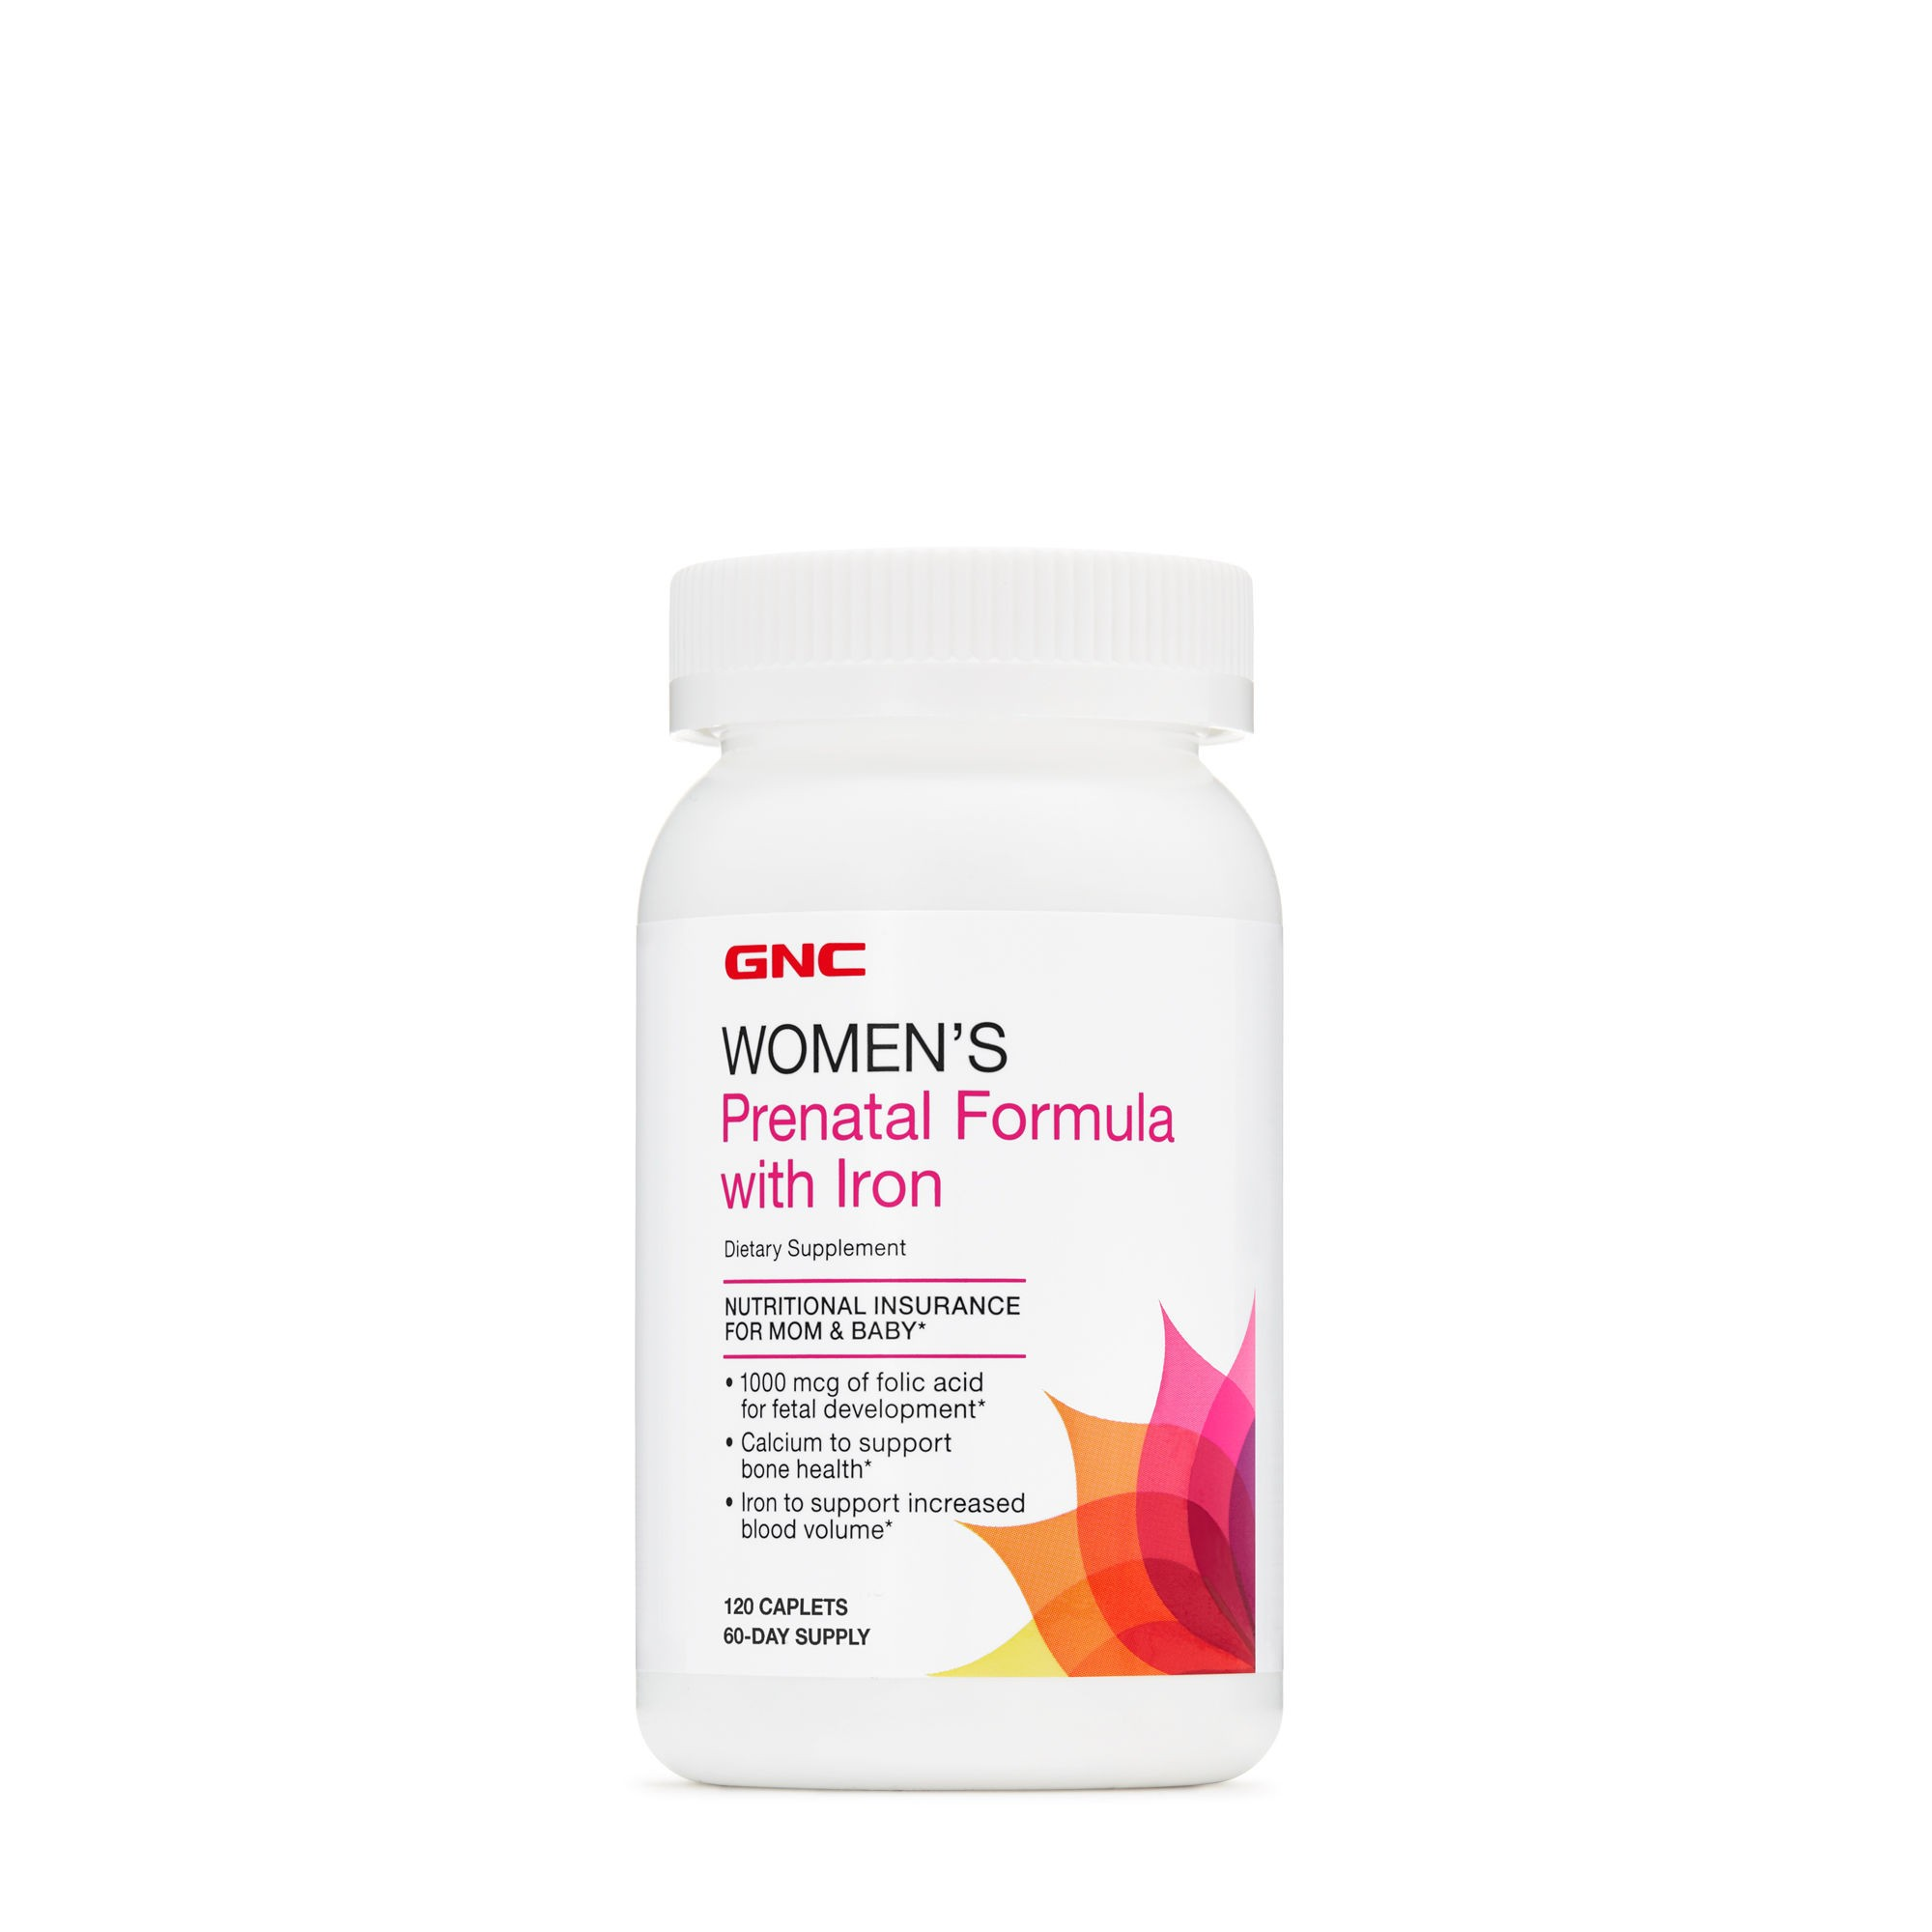 GNC Women's Prenatal Formula with Iron, Formula Prenatala cu Fier, 120 tb